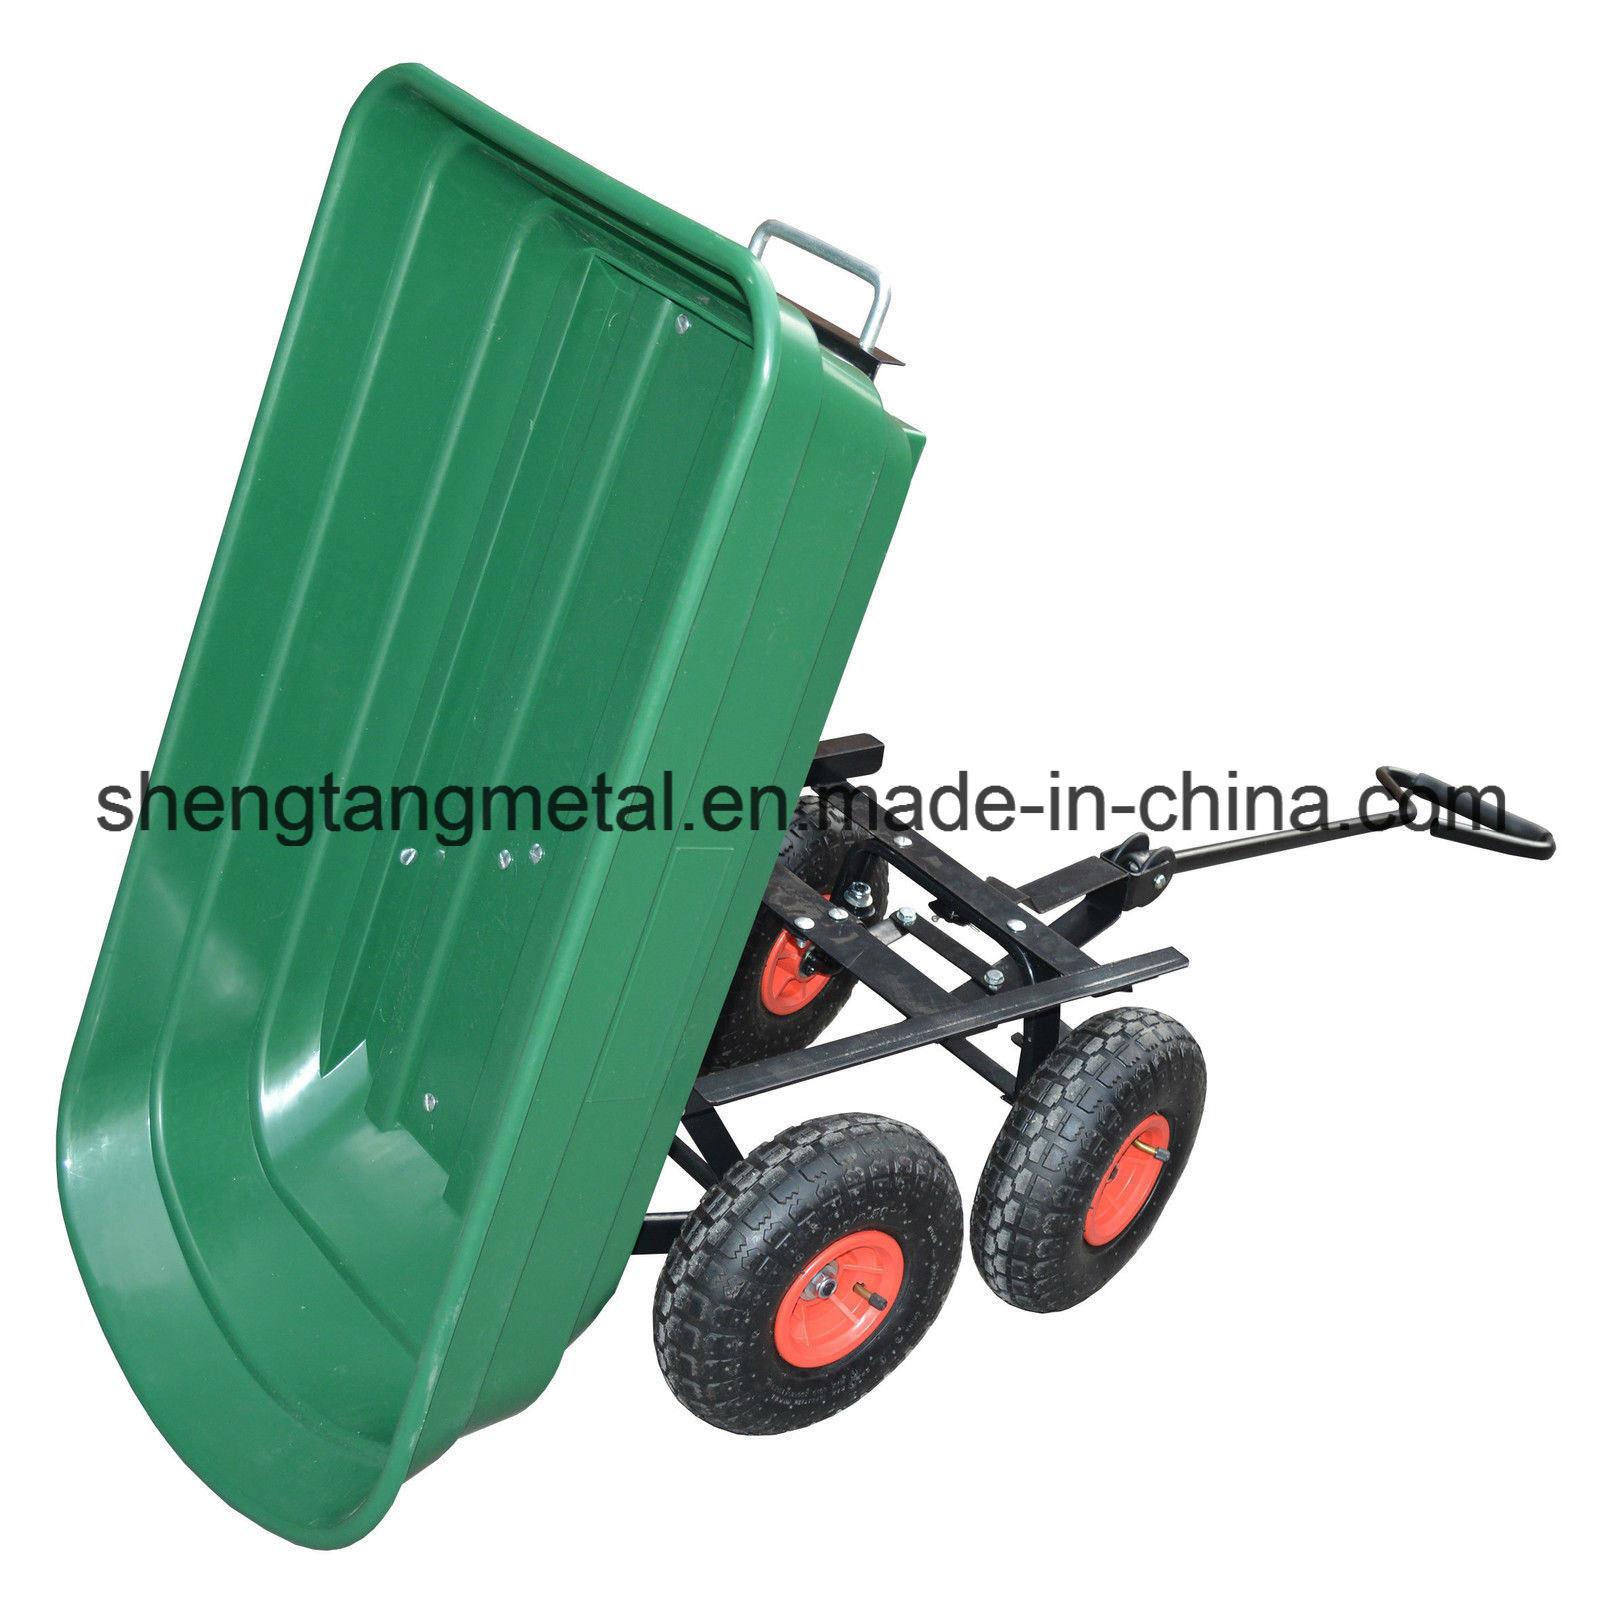 Chine Chariot 4 Roues Chariot De Jardin 75L Sac Chariot ... avec Chariot De Jardin 4 Roues